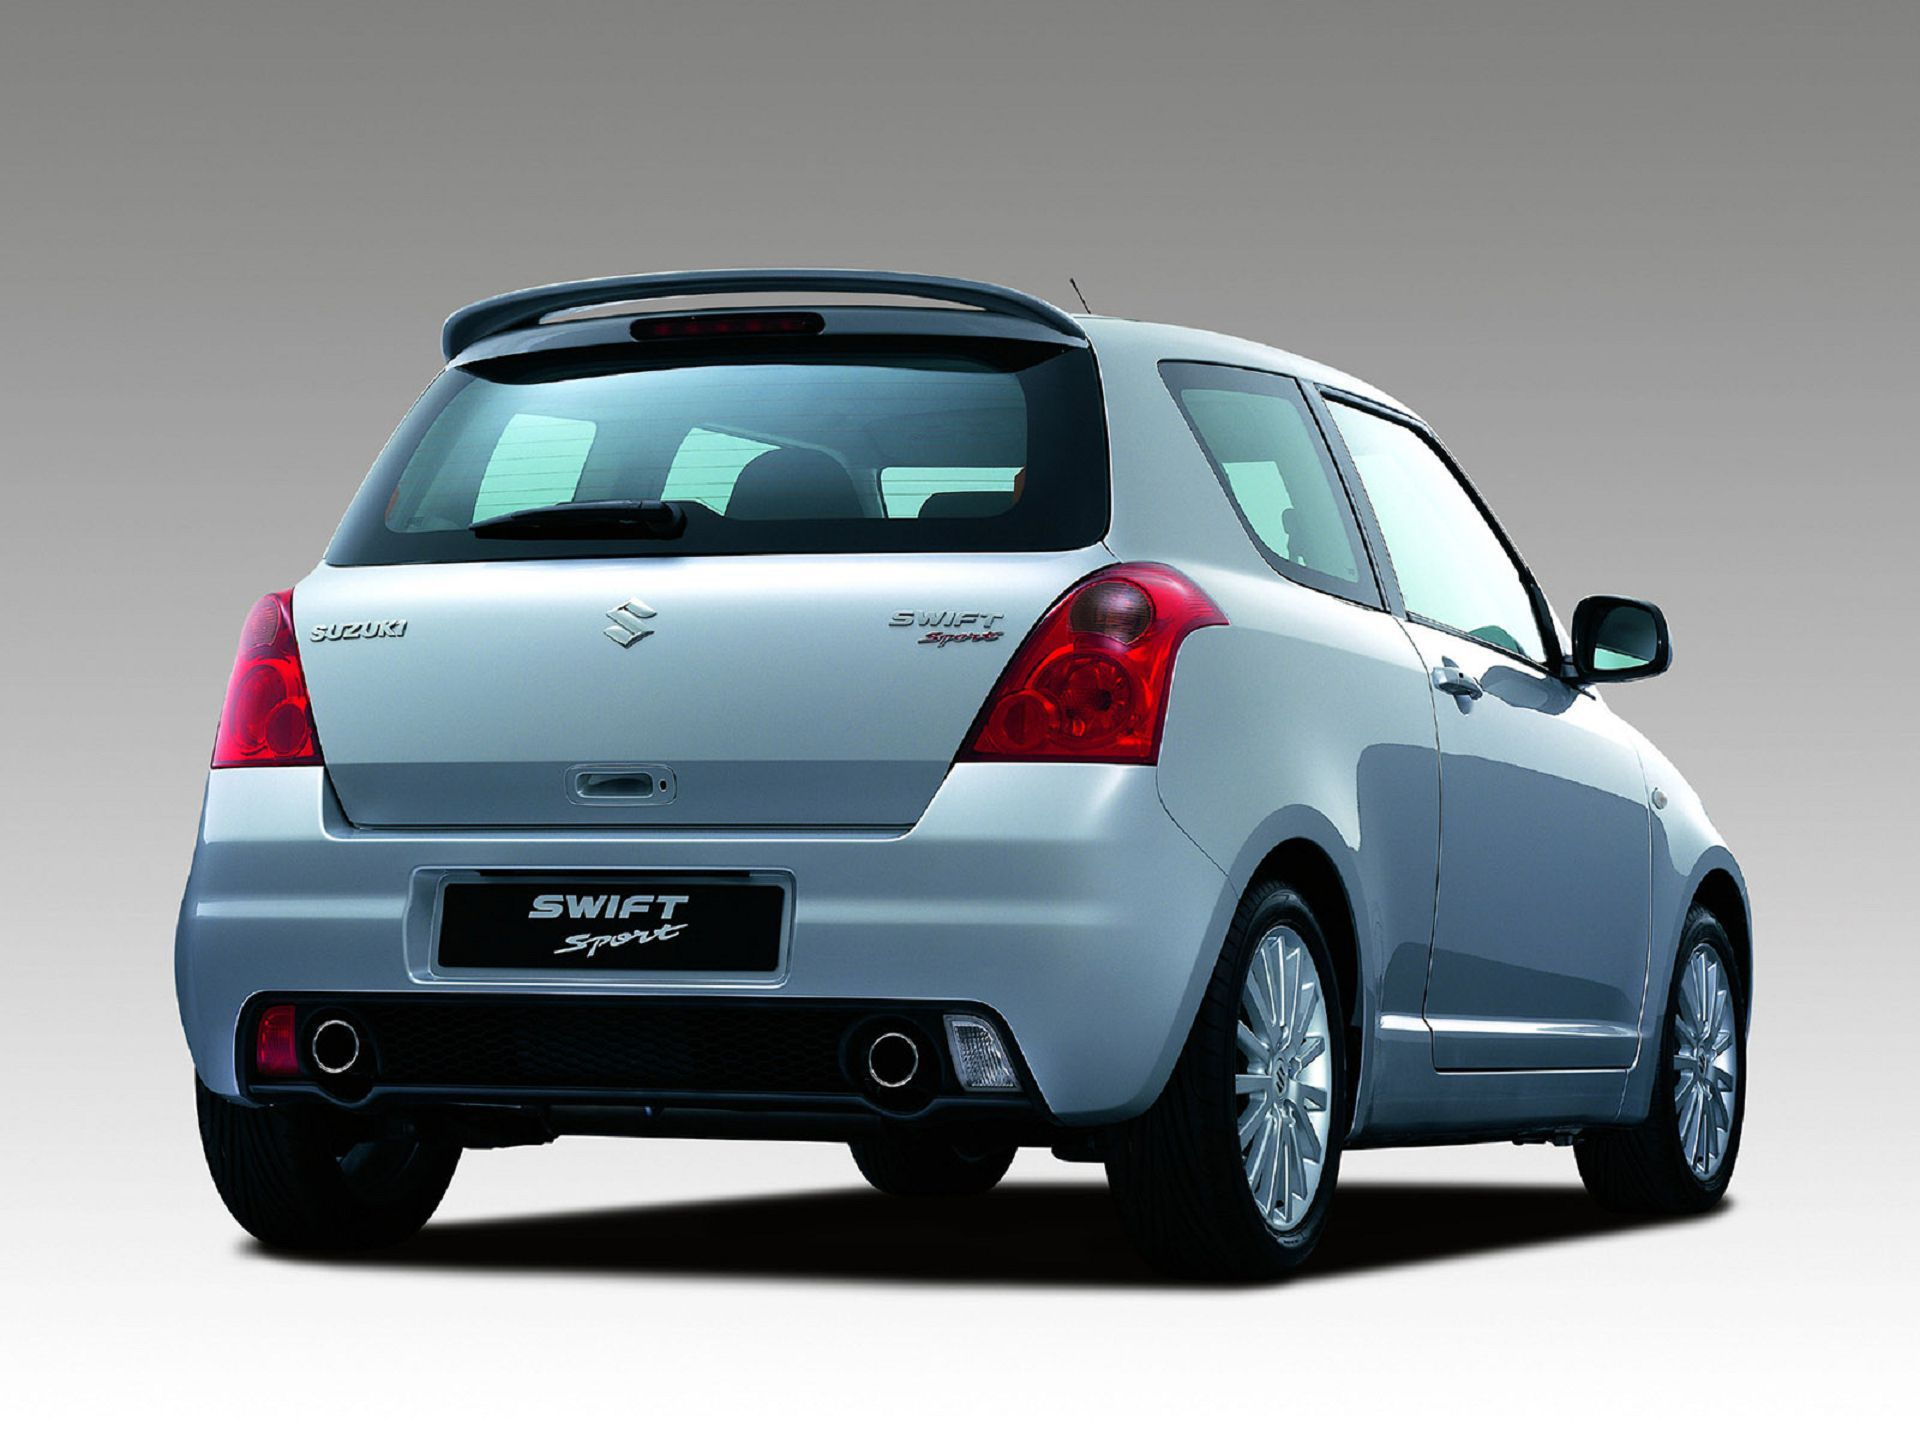 Suzuki Swift Sport Hd